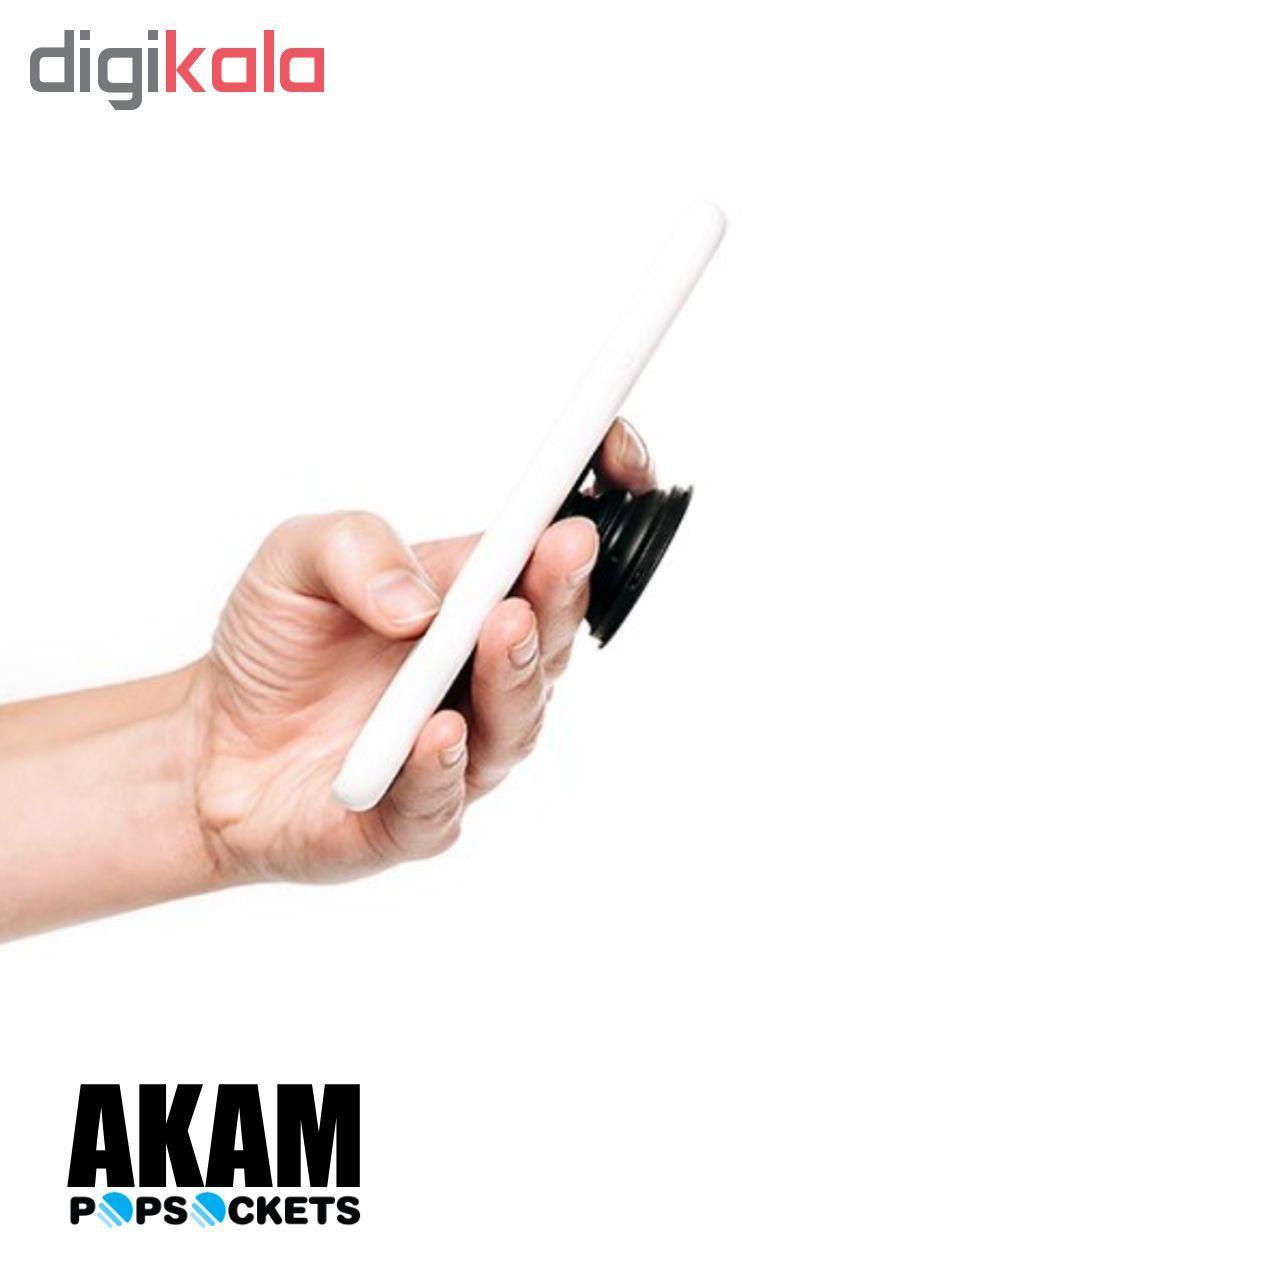 پایه نگهدارنده گوشی موبایل پاپ سوکت آکام مدل APS0054 main 1 9